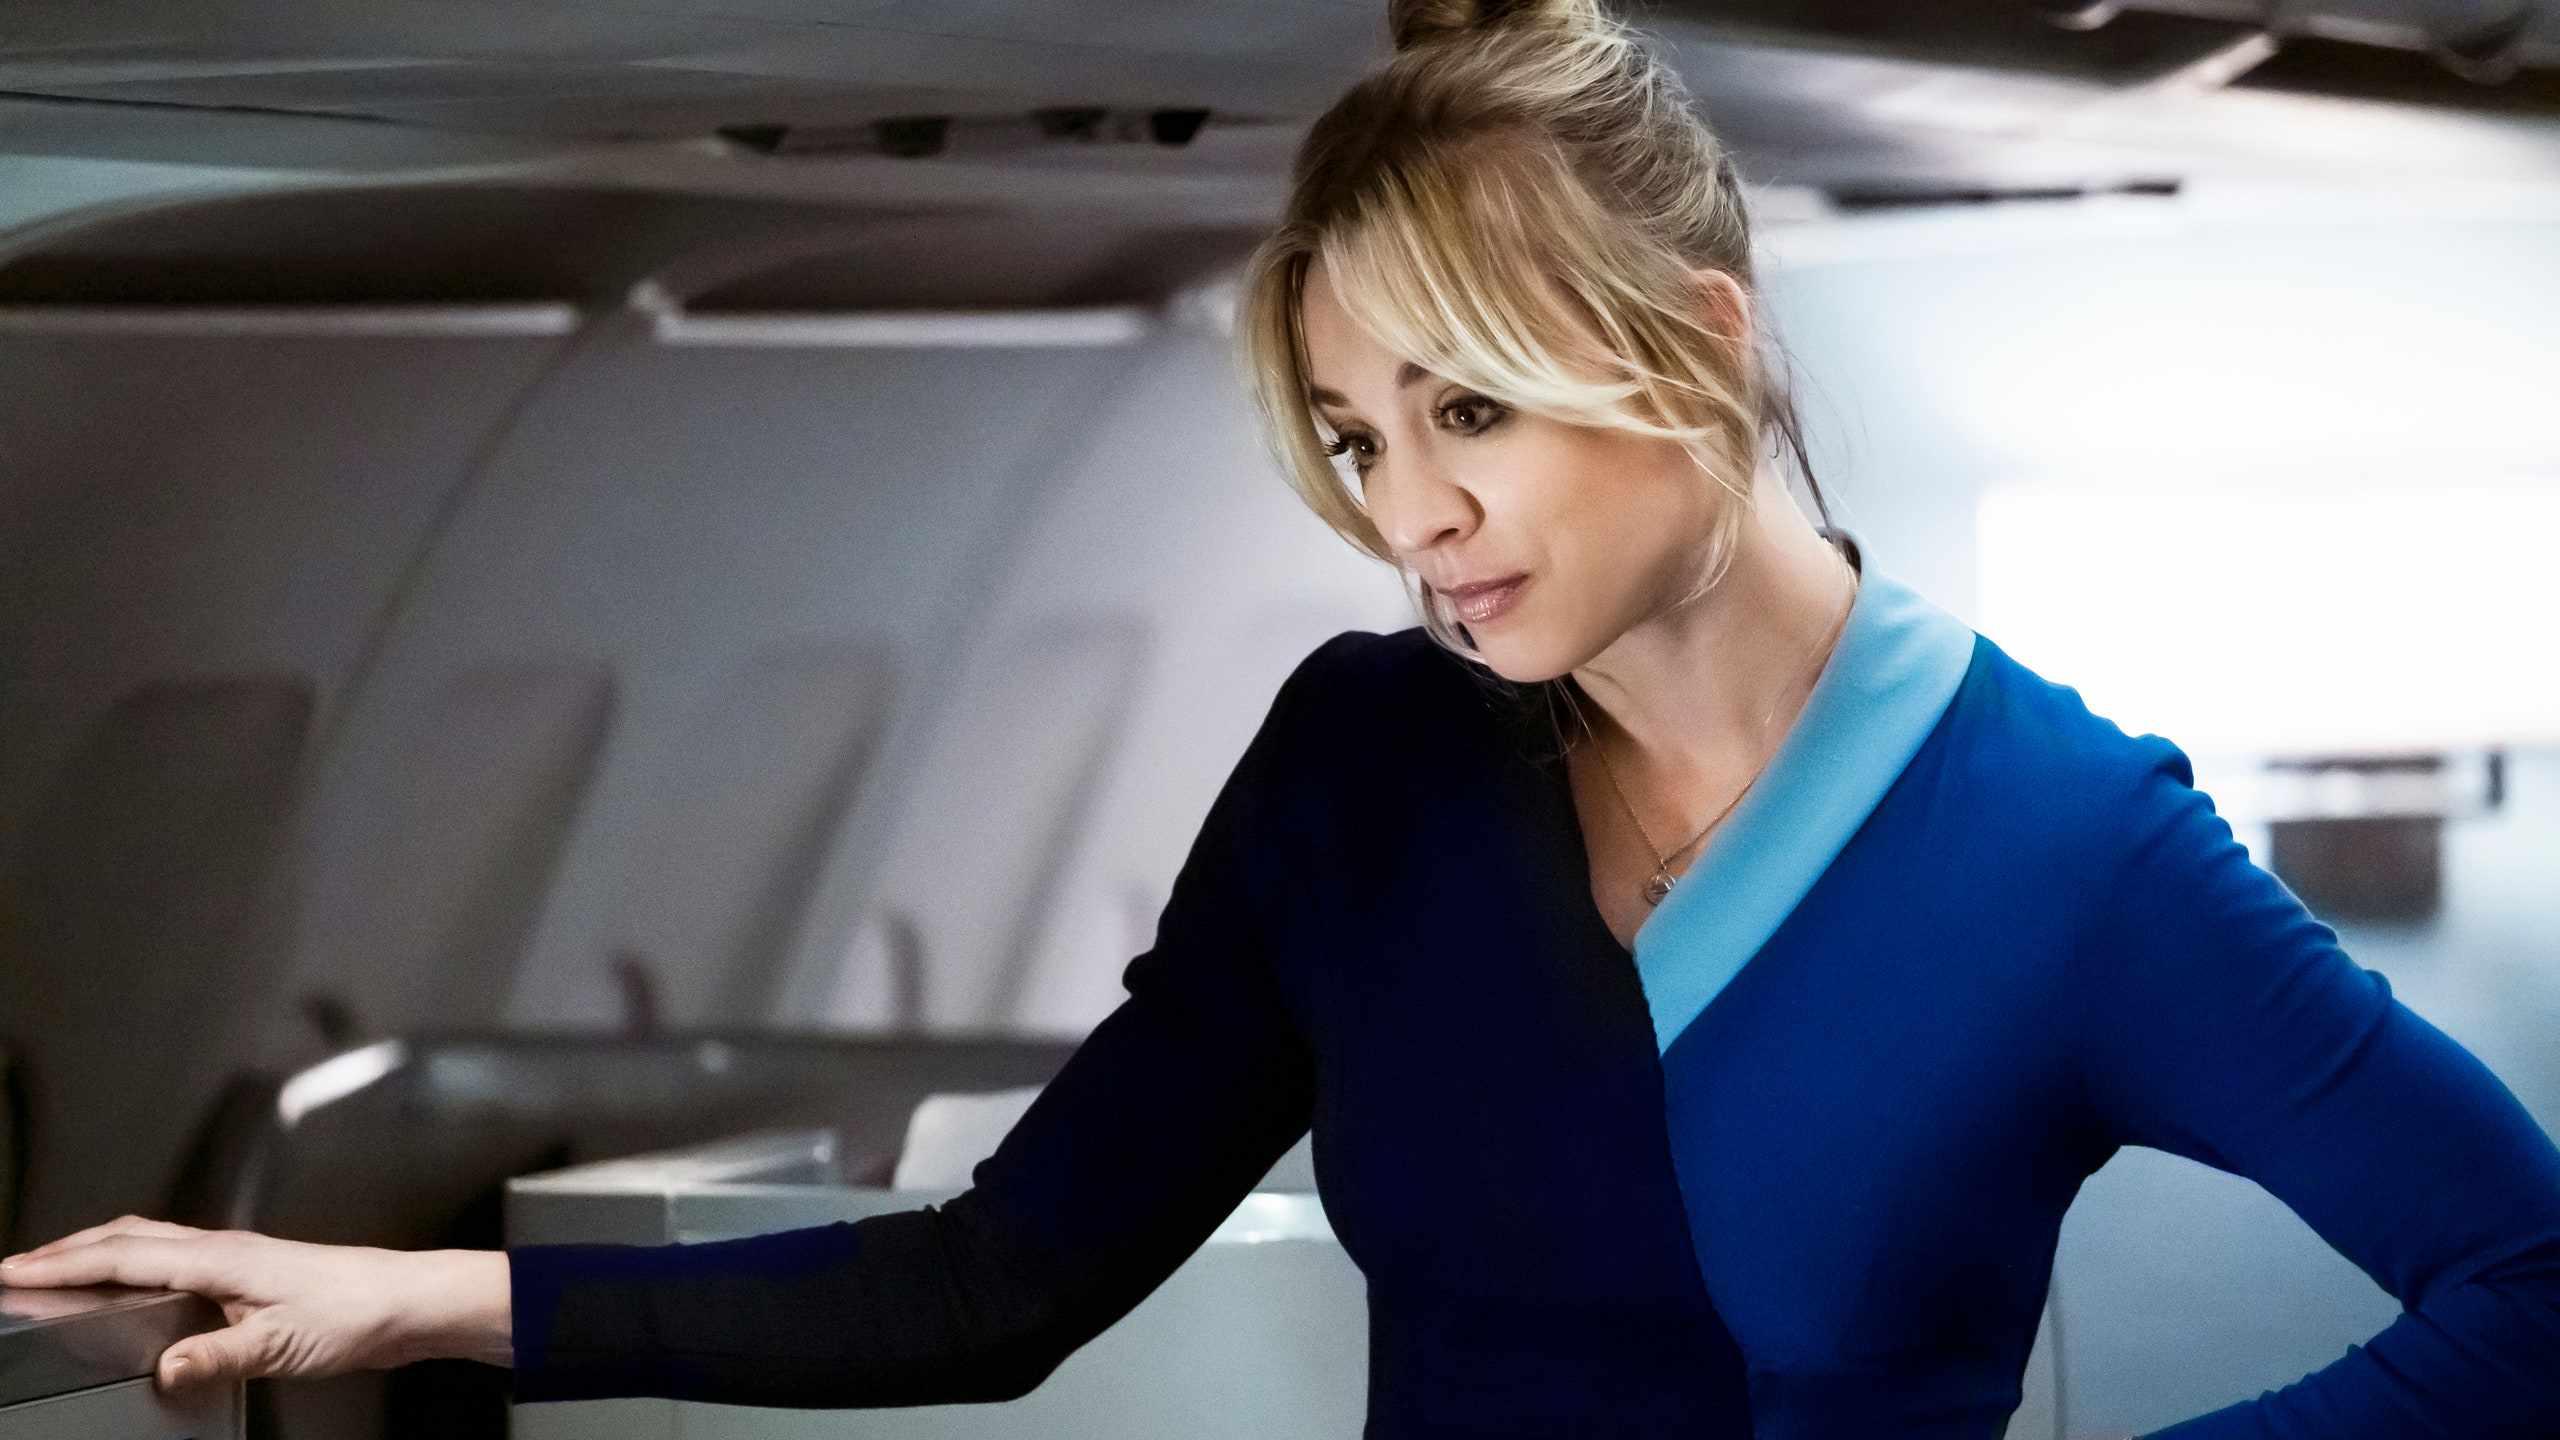 Kaley Cuoco in The Flight Attendant (2020)